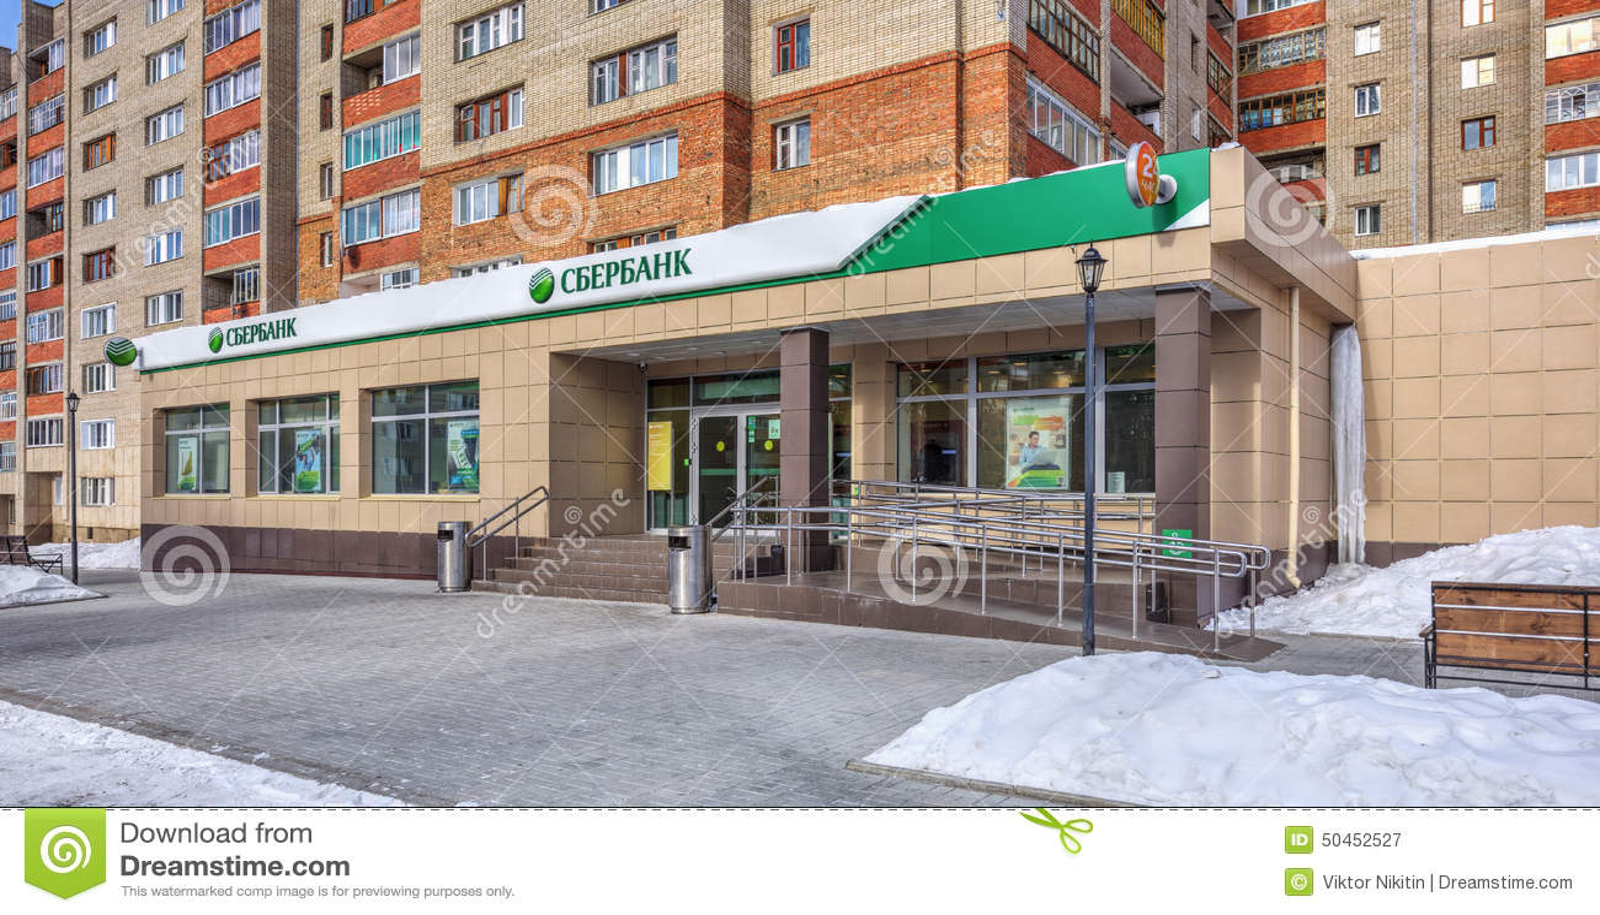 Irkutsk Regional Clinic has received the use of an innovative X-ray machine 50